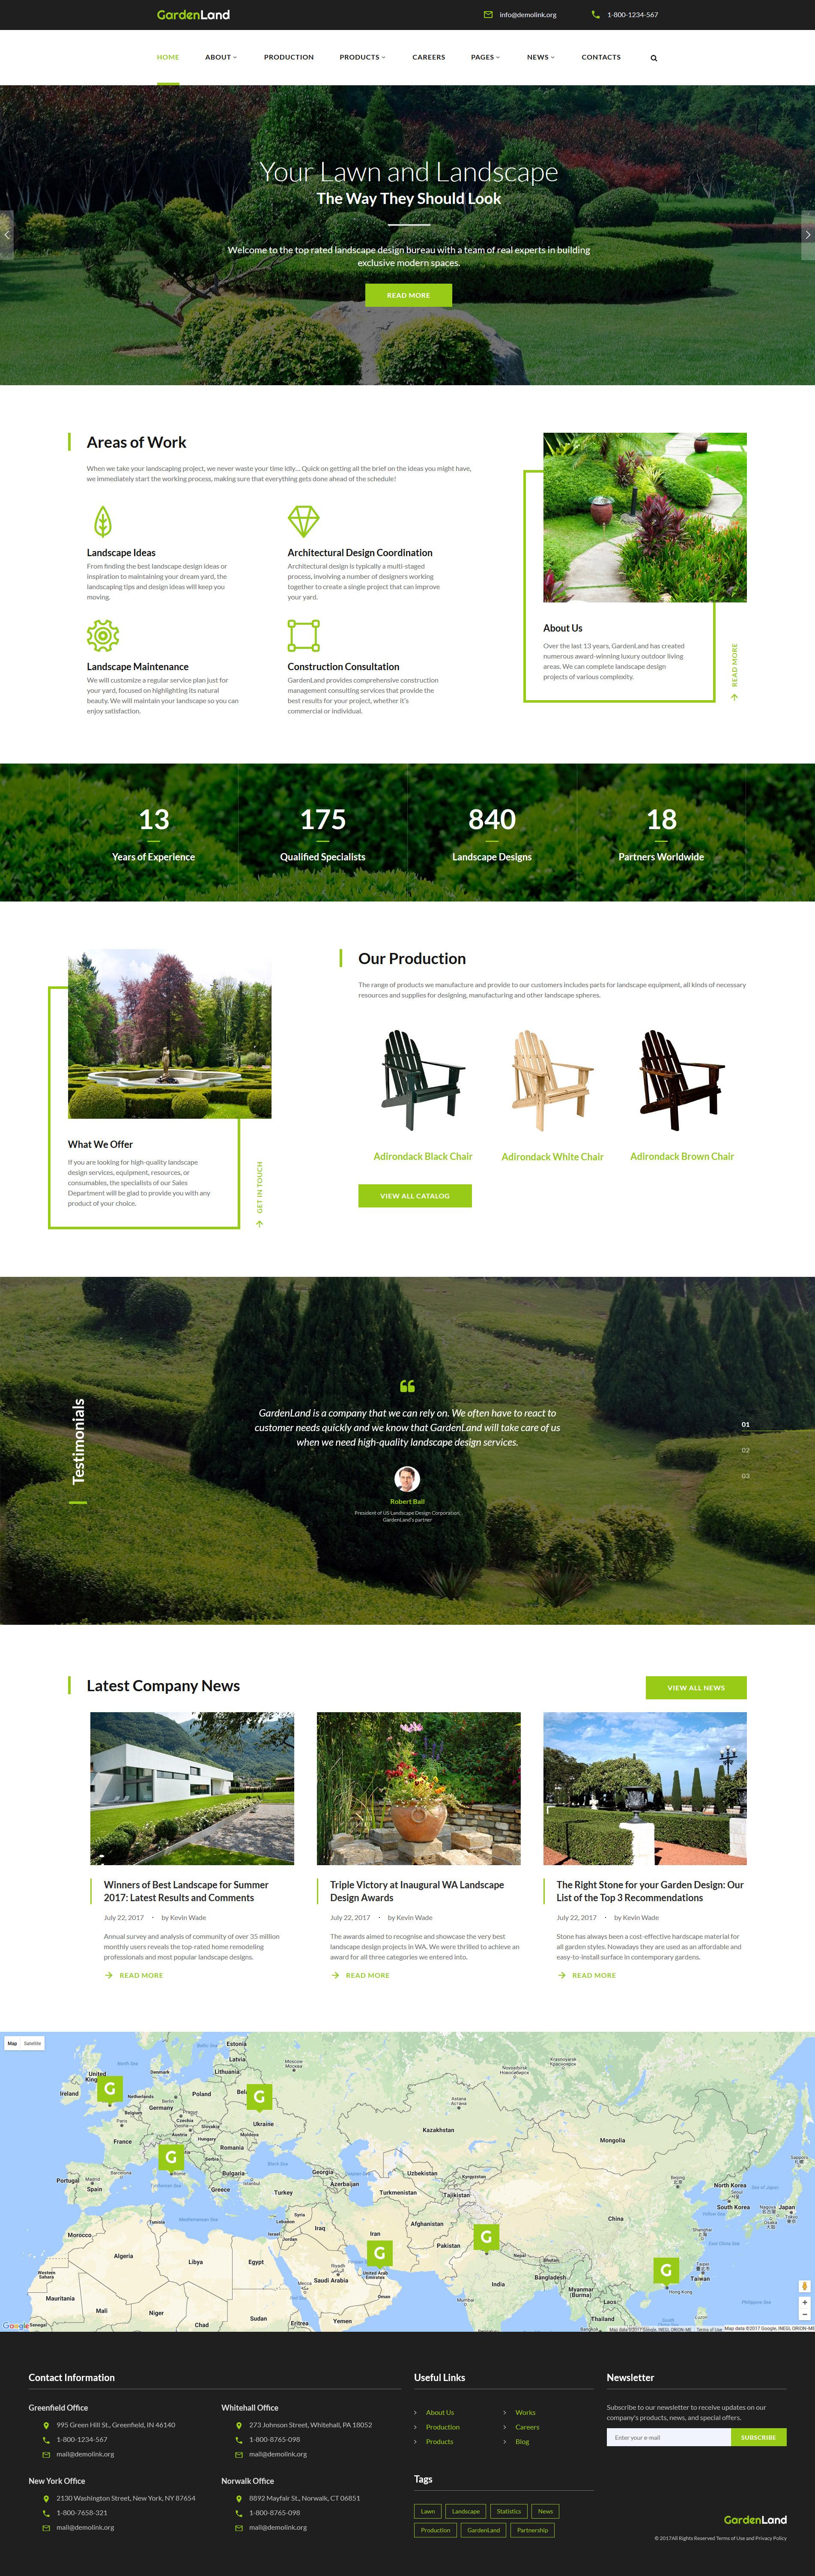 Responsywny szablon strony www Garden Land - Exterior Design Multipage #62146